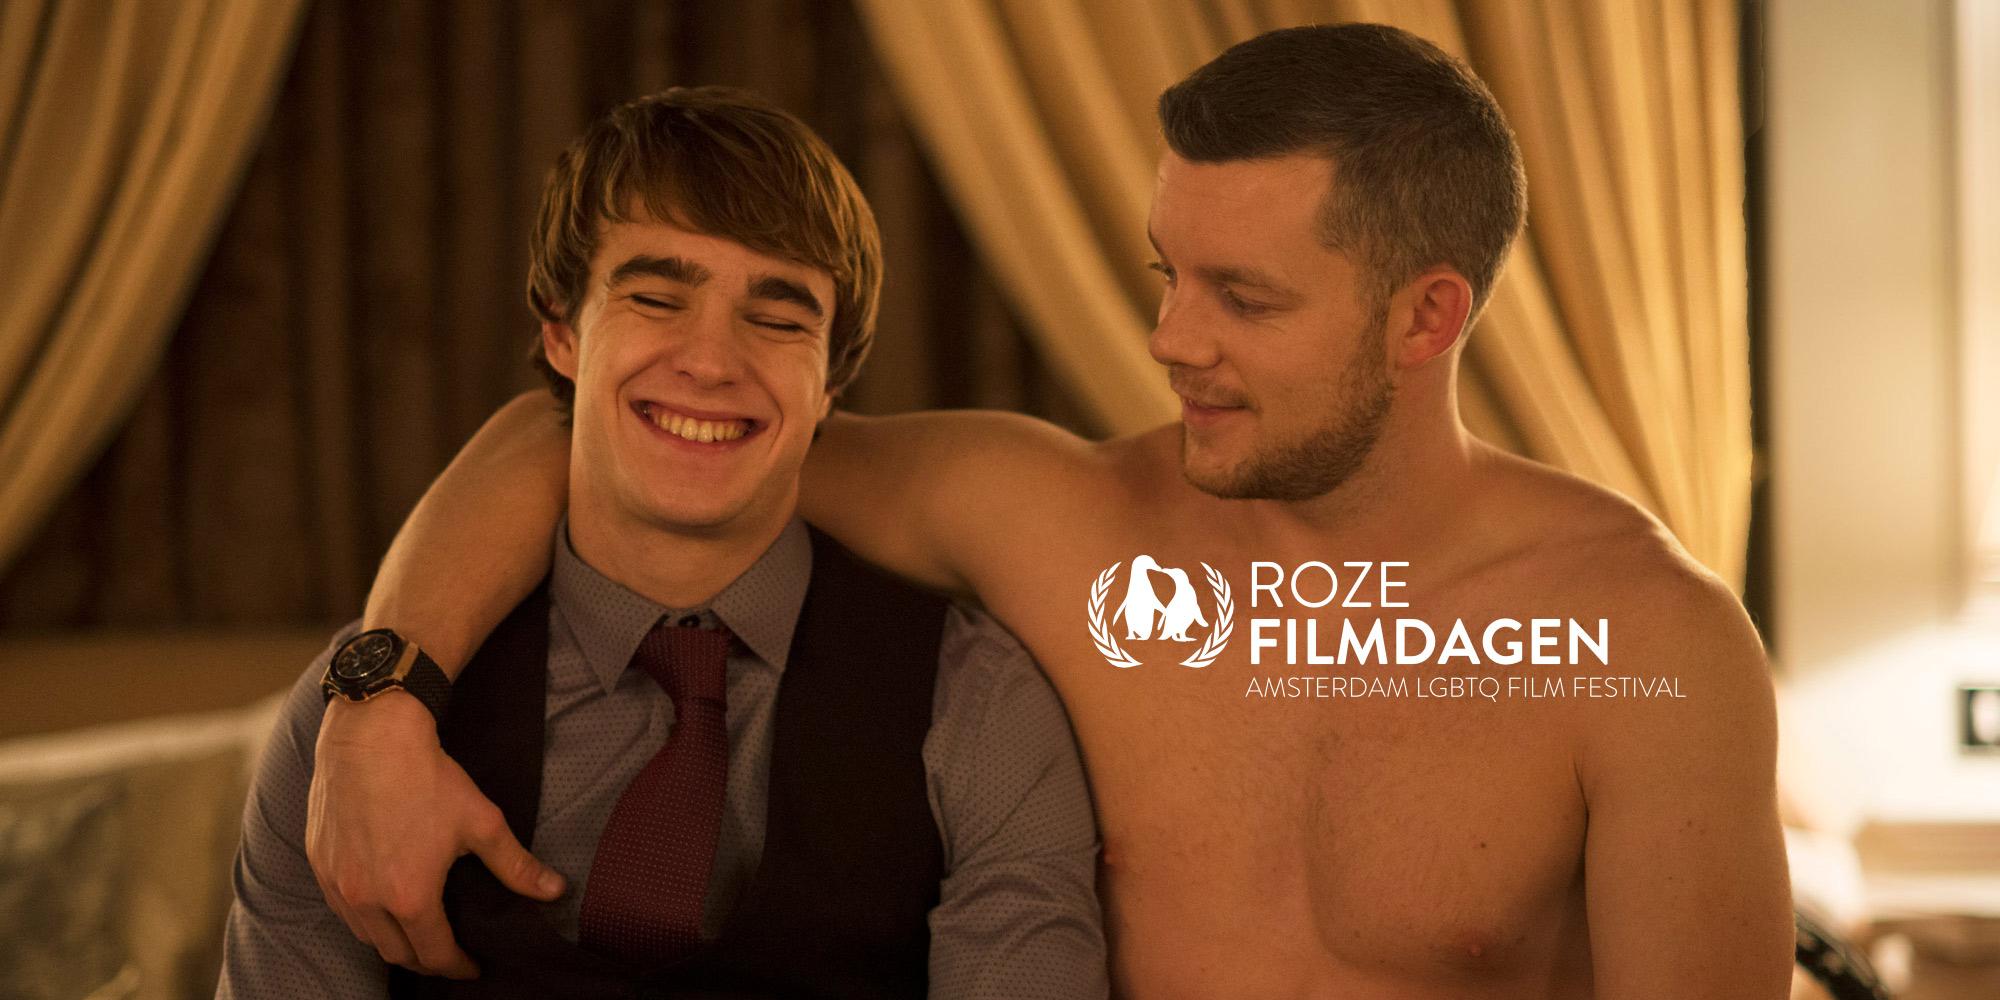 Our 7 Best Gay Movies Roze Filmdagen Amsterdam 2017 LGBTQ Film Festival